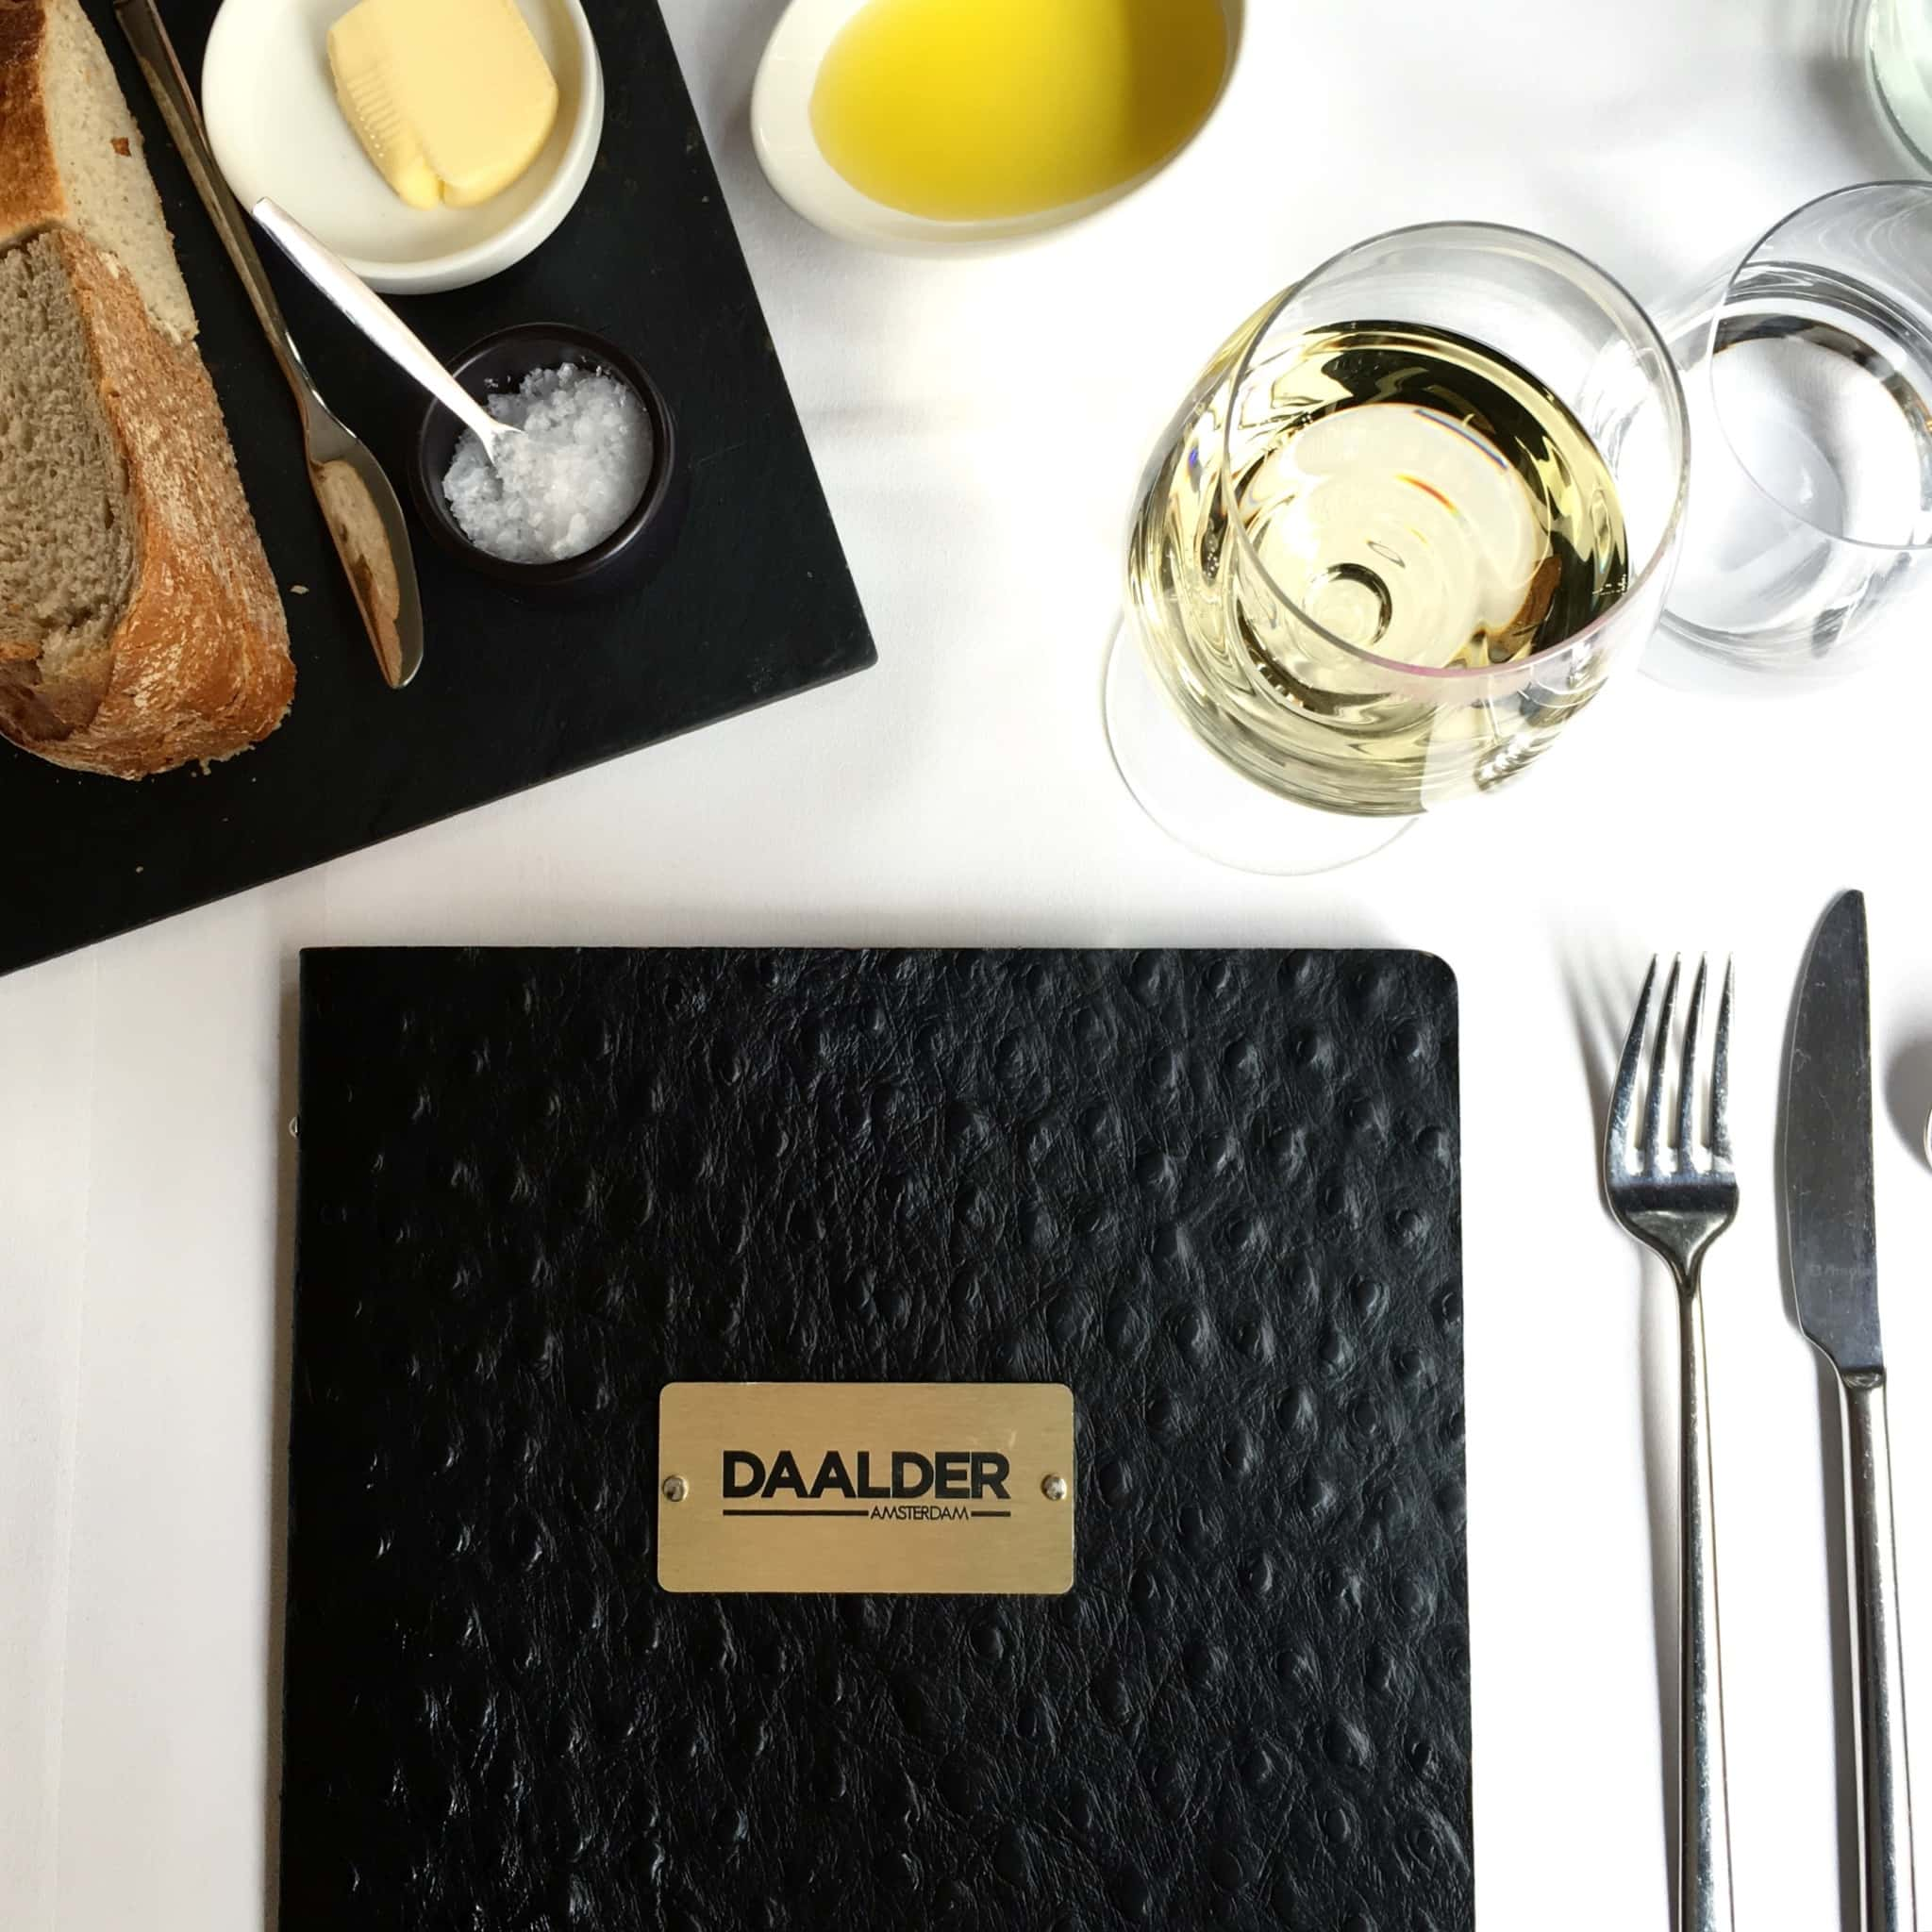 image2 - Restaurant Daalder - 020 Review